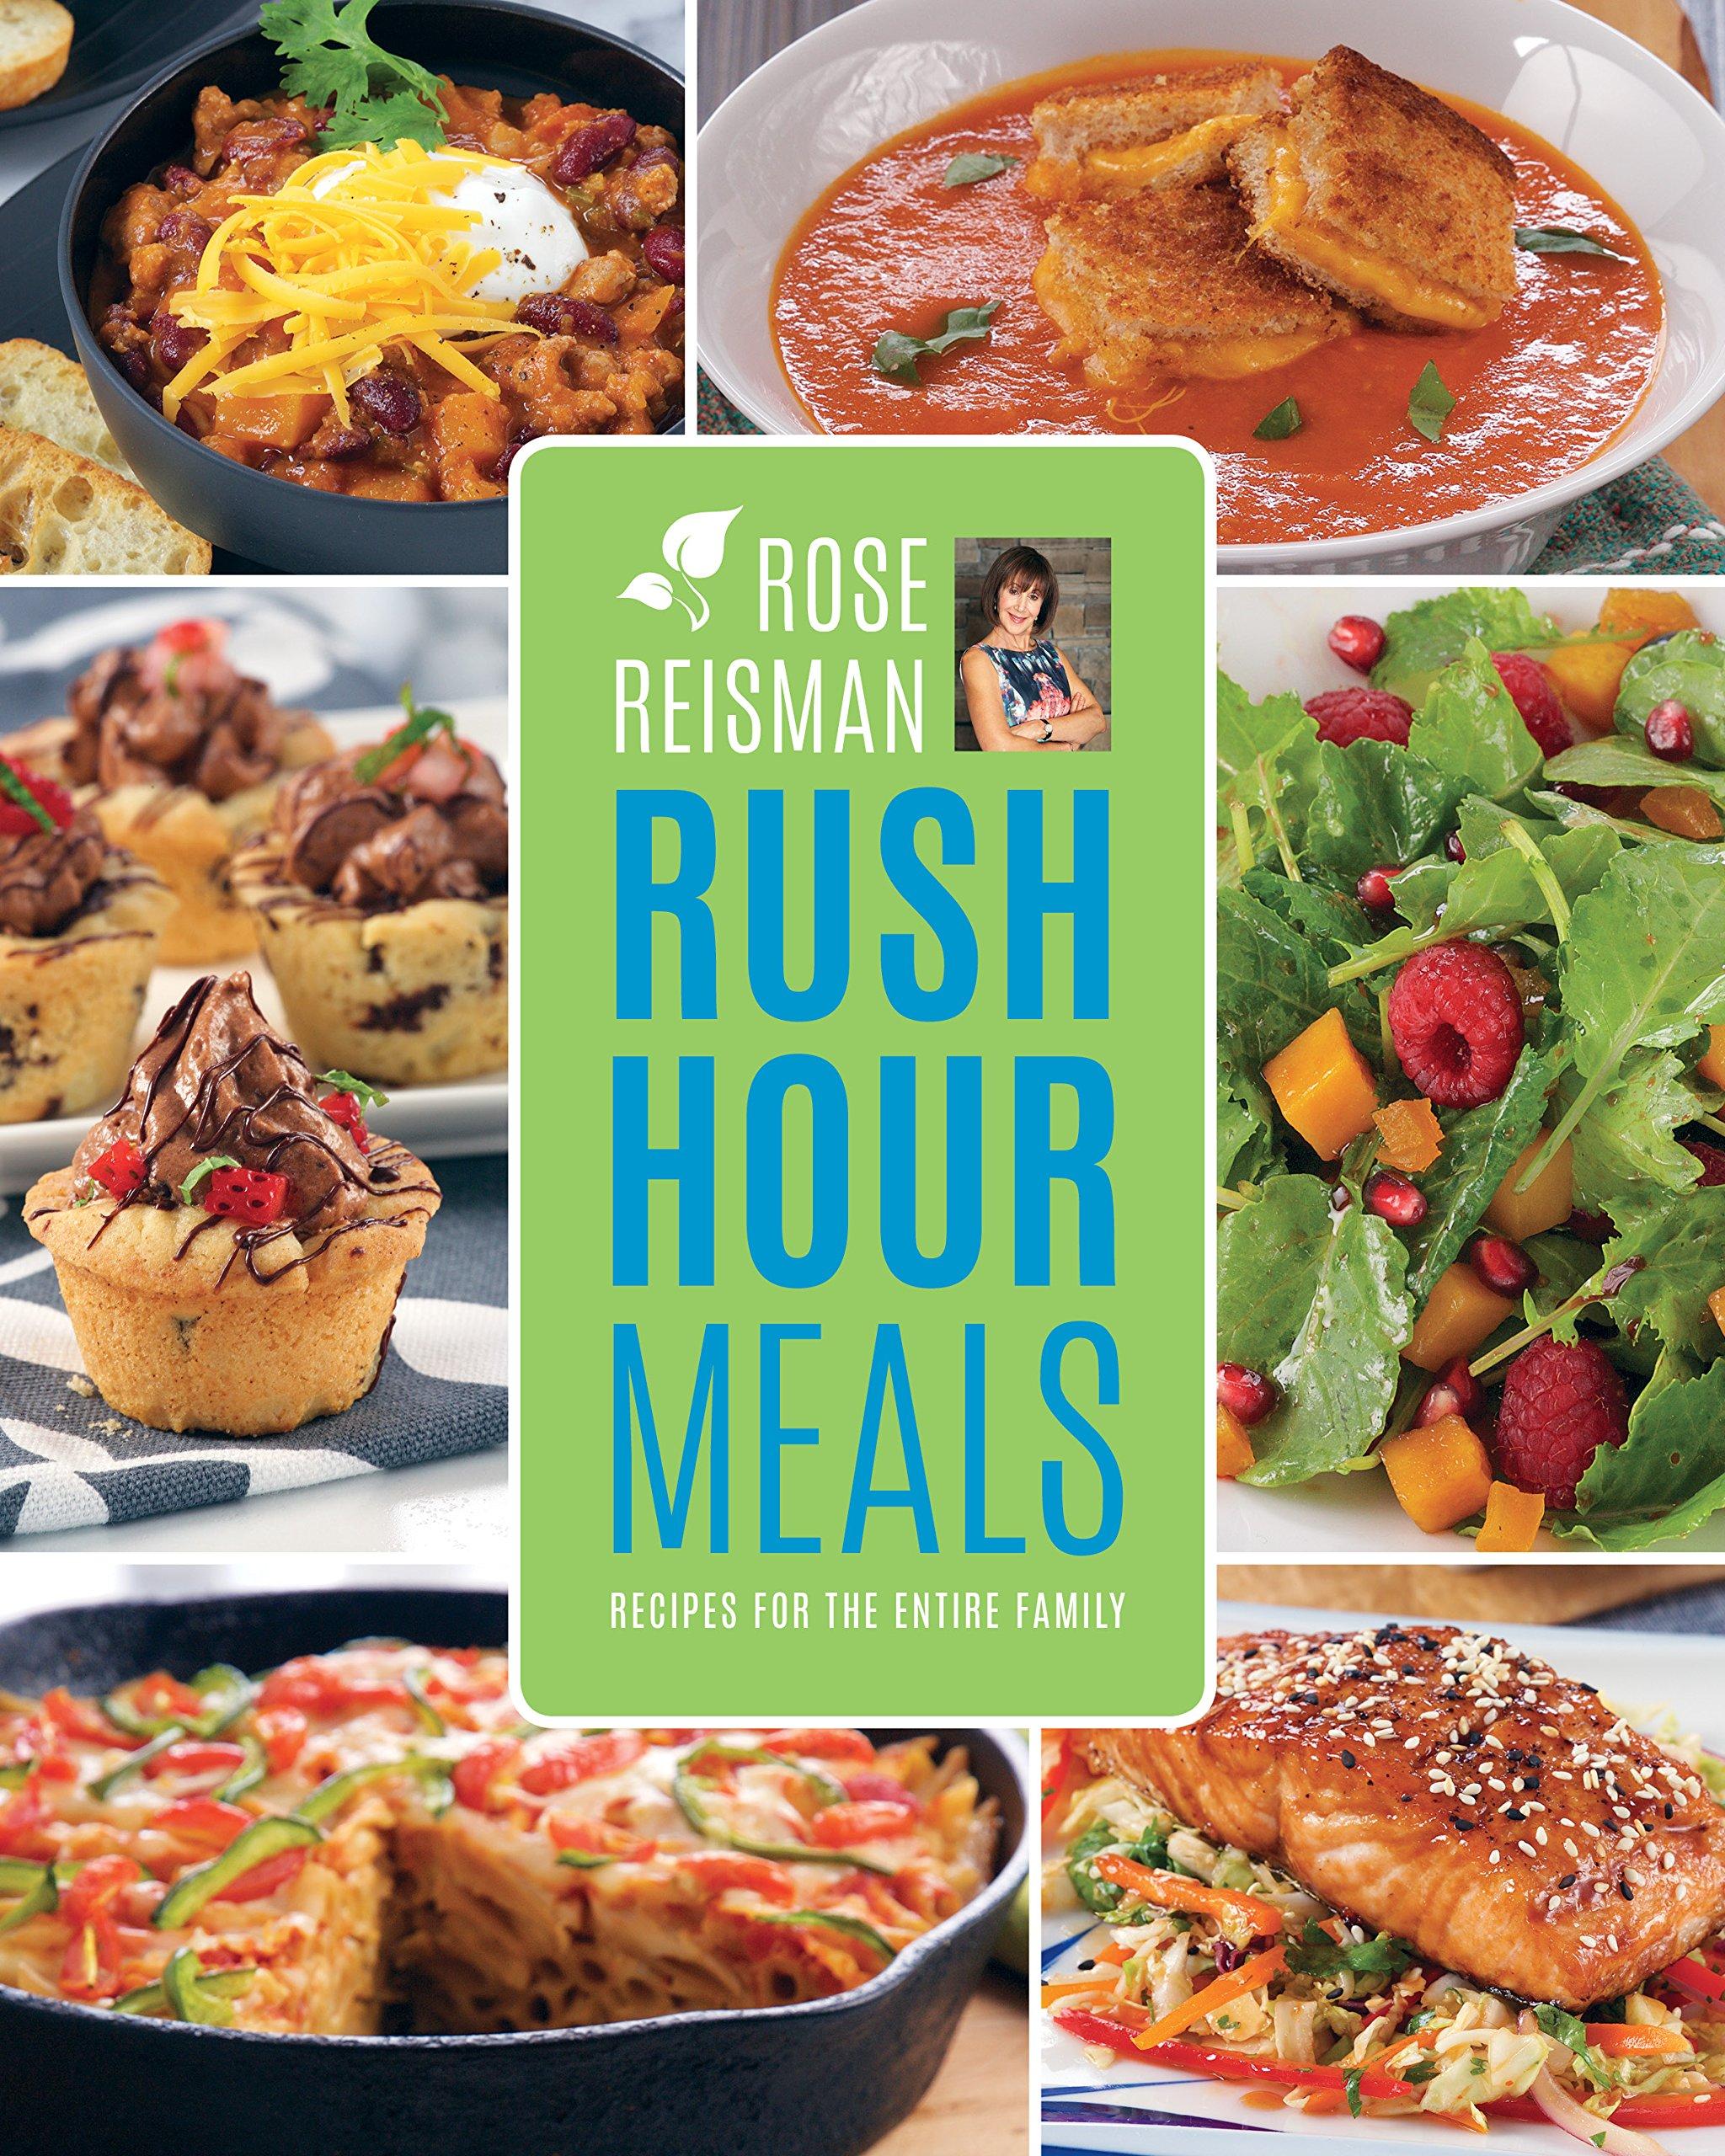 Rush Hour Meals Cookbook